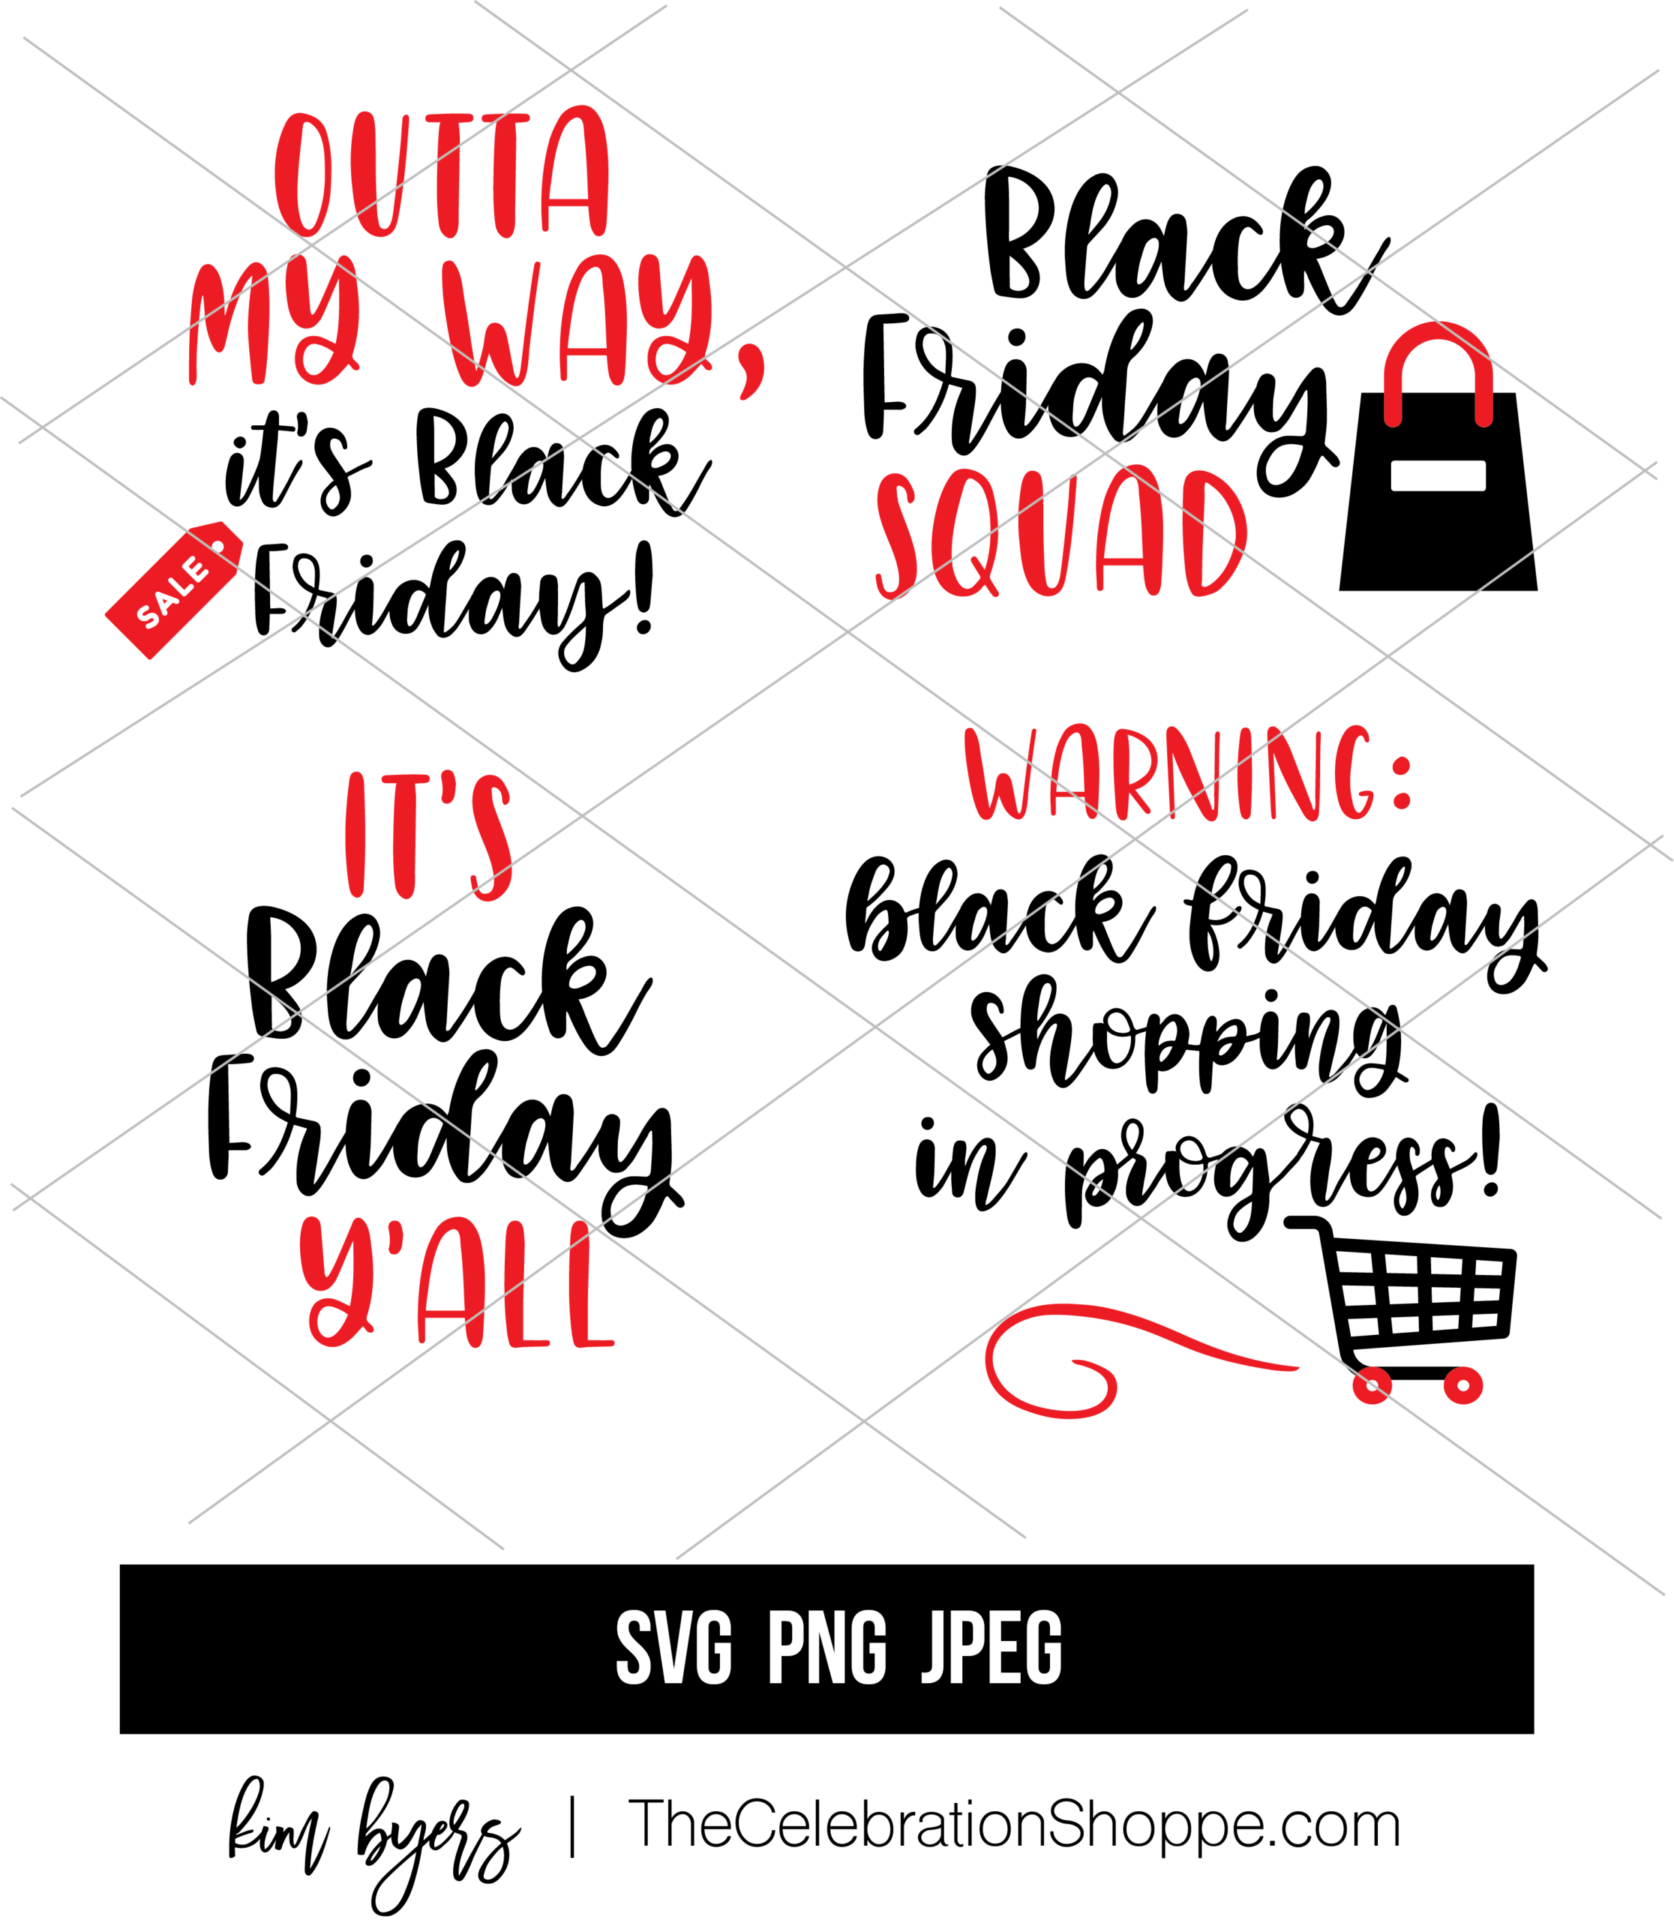 Black Friday SVG Files Kim Byers